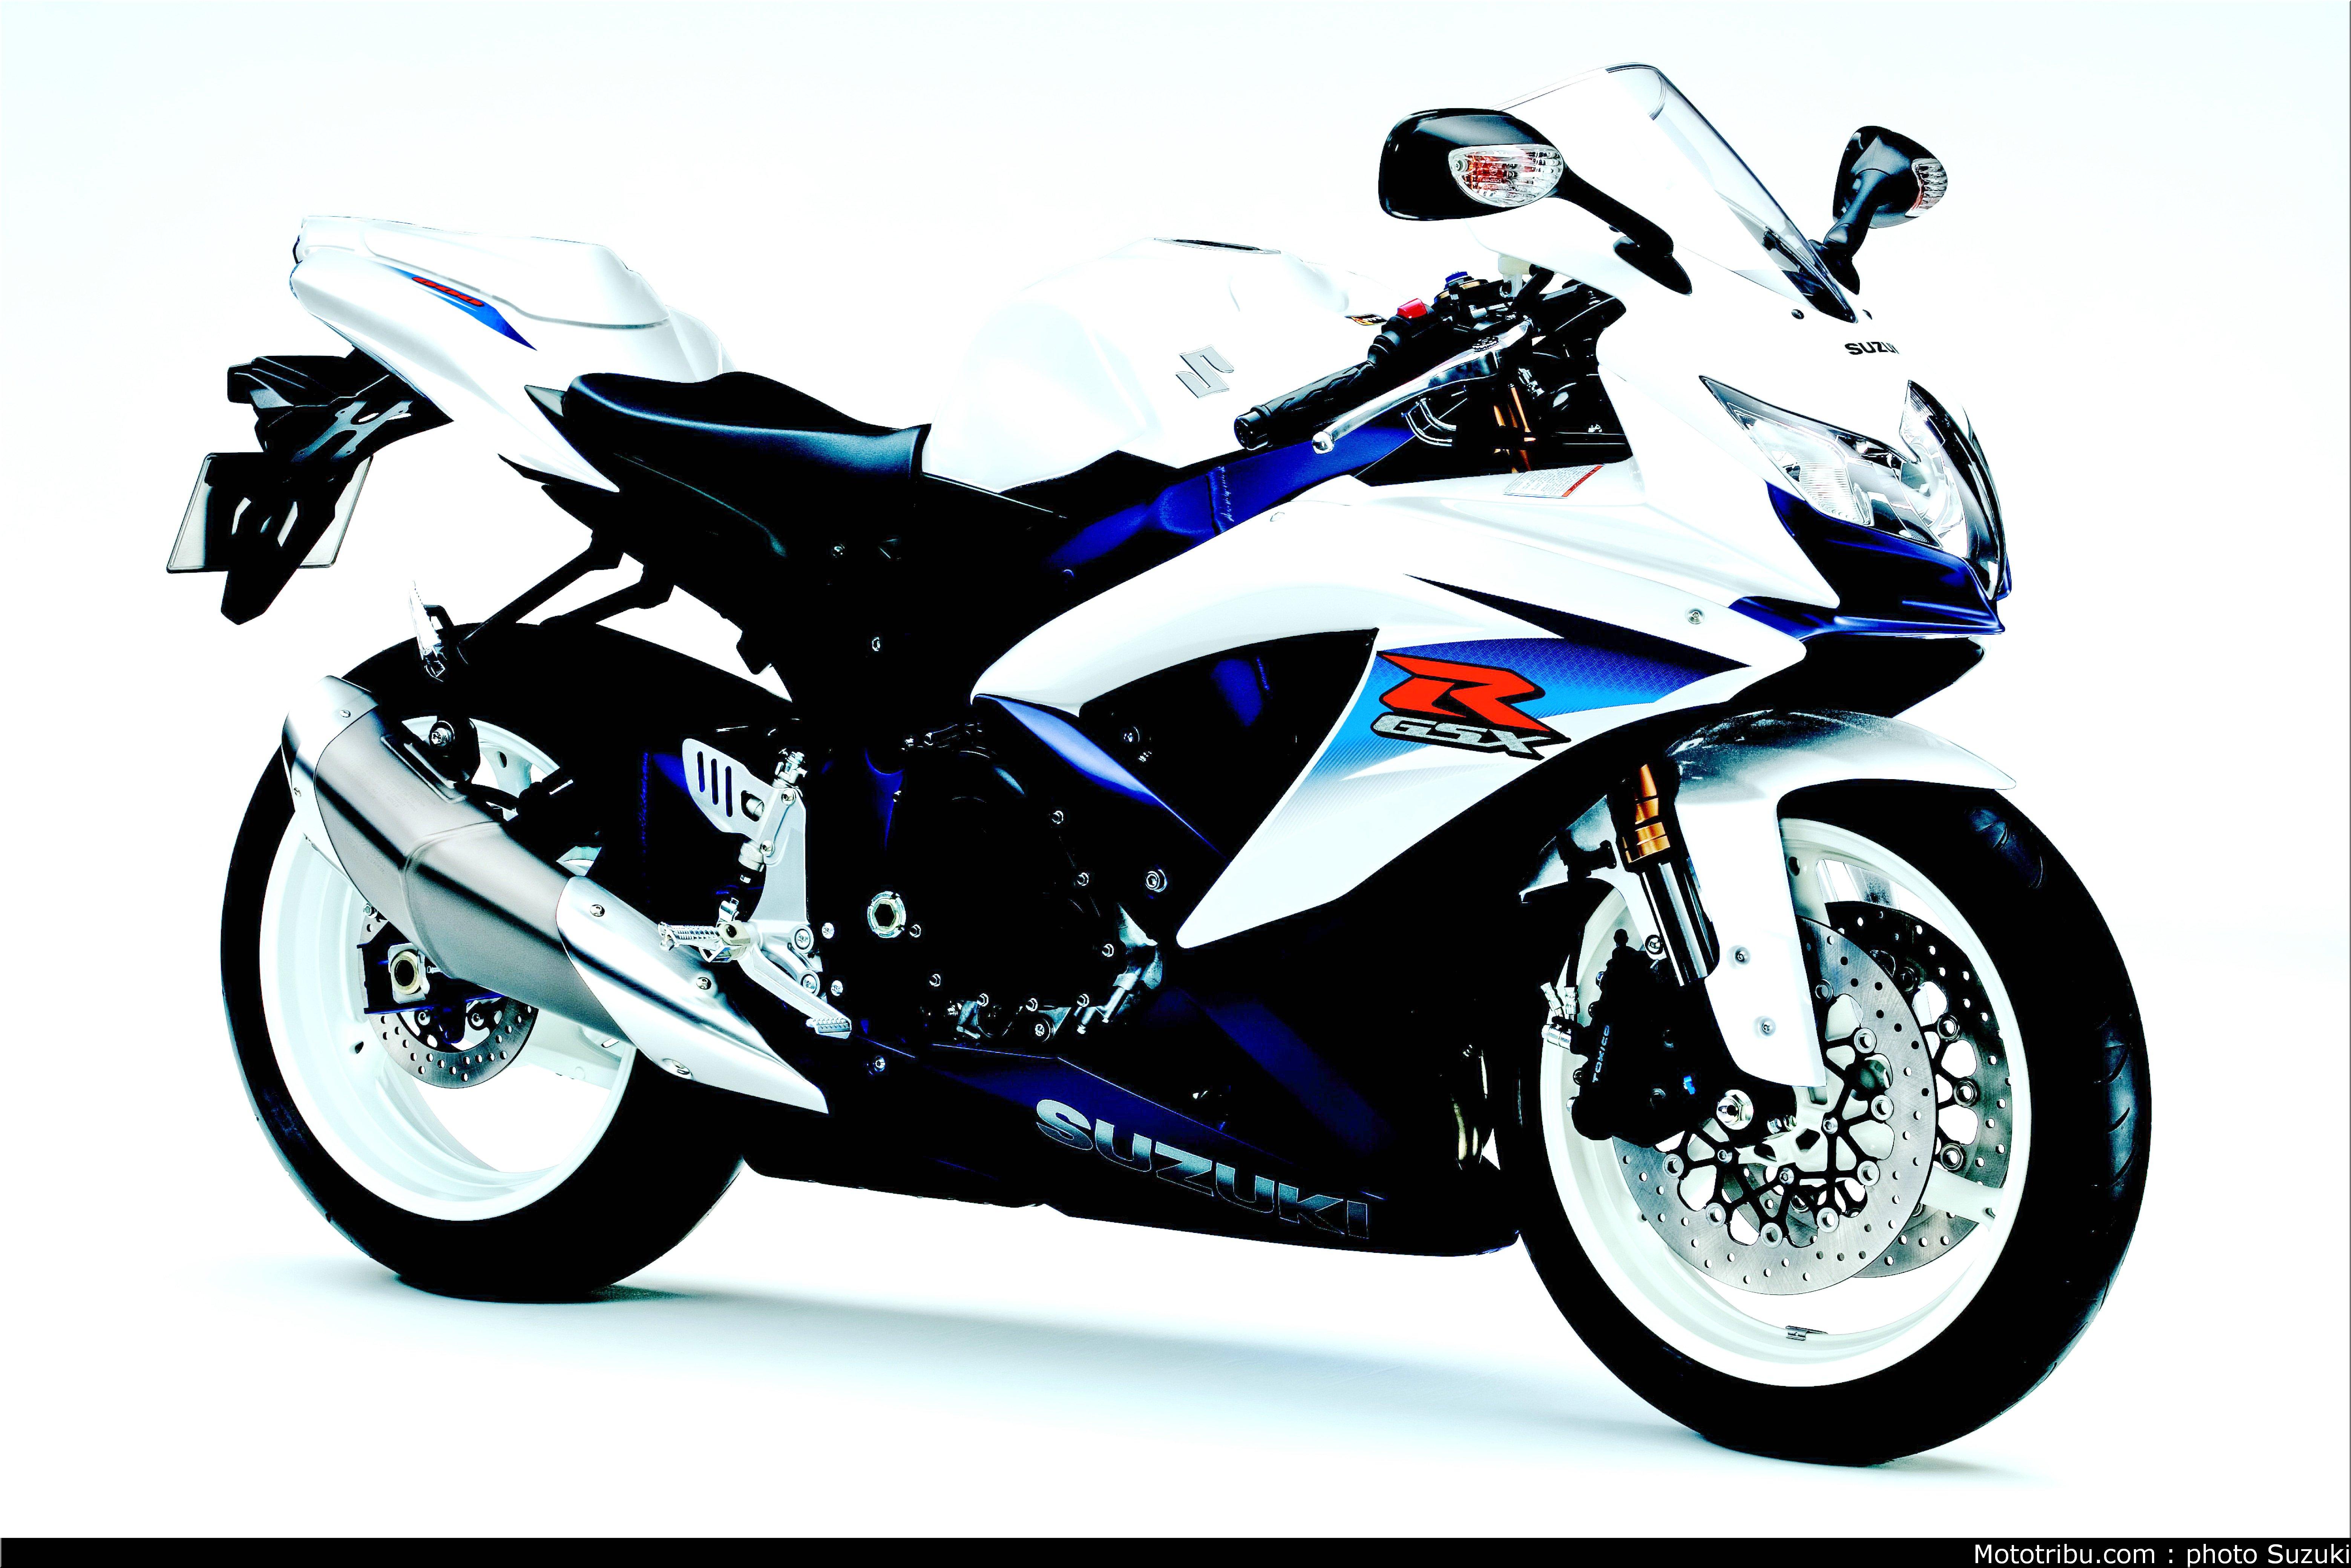 Suzuki Gsxr 600 Wallpaper 6848 Hd Wallpapers HTML code